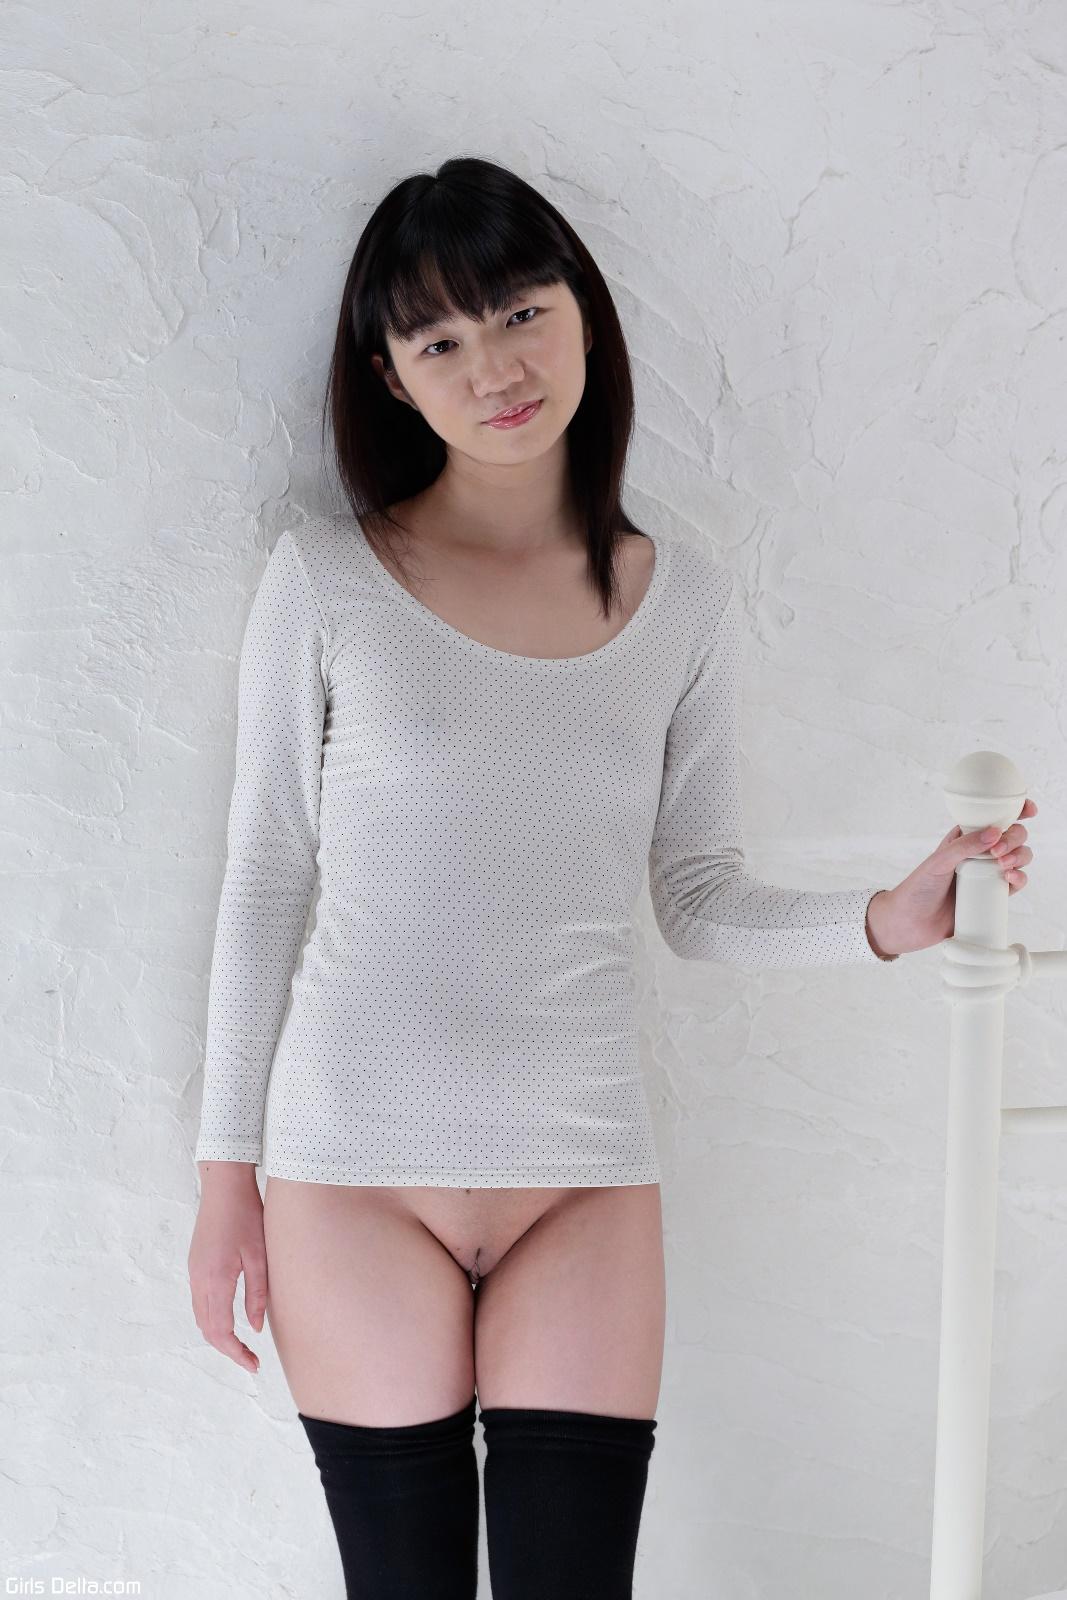 GirlsDElta 18